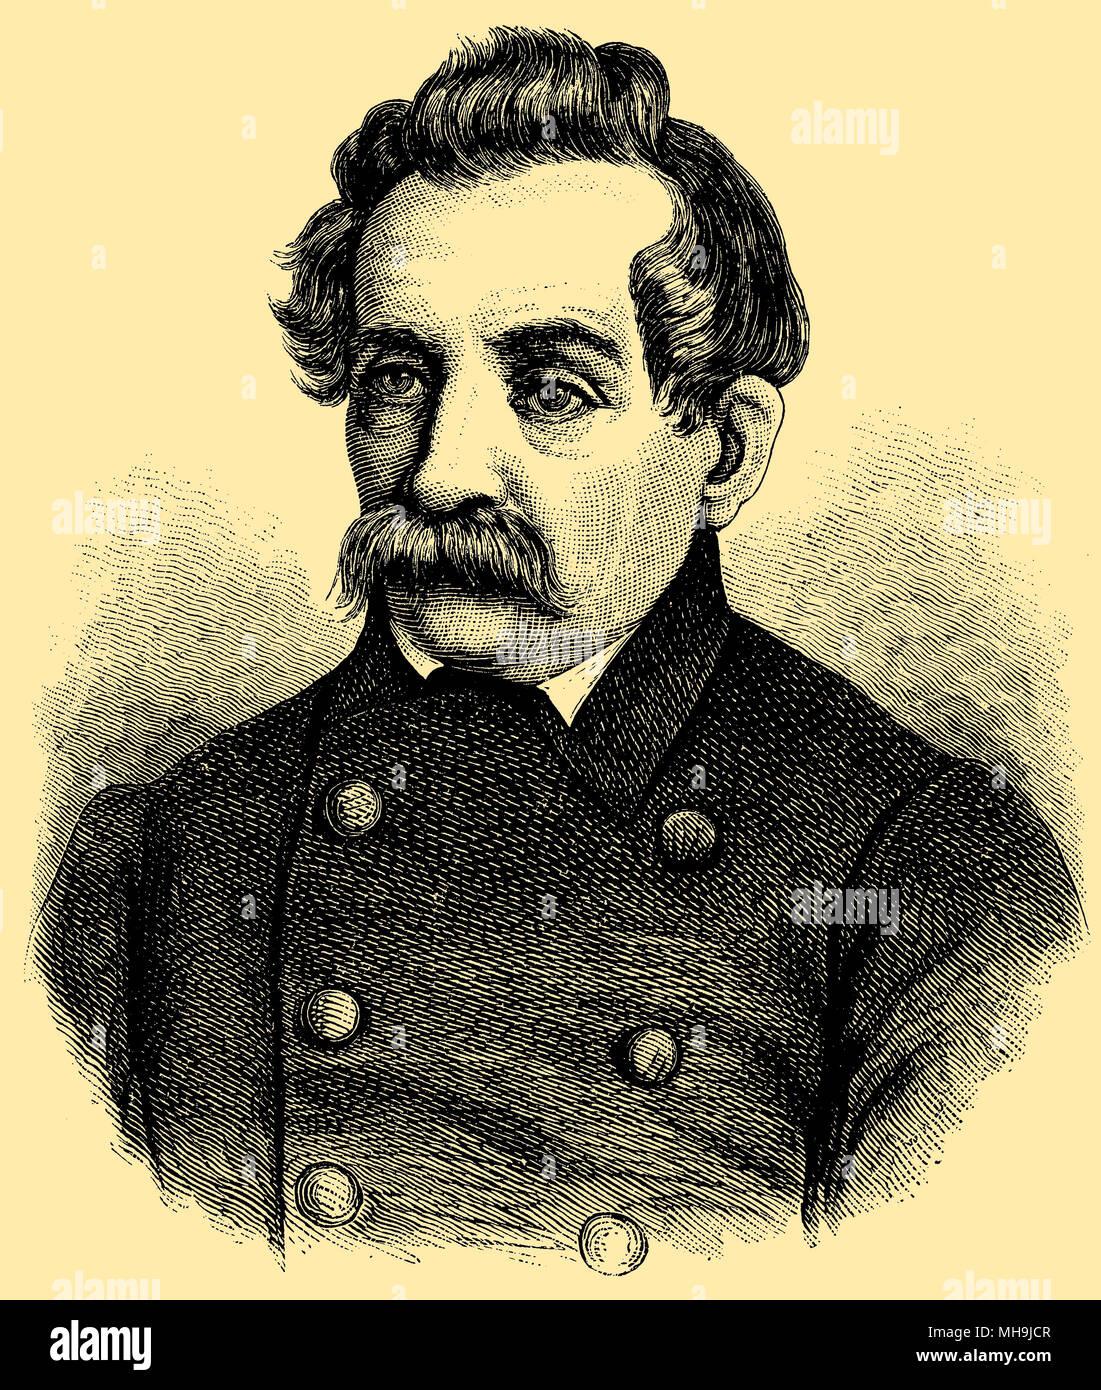 Heinrich Ludwig Beitzke (geboren Februar 15, 1798, starb am 10. Mai 1867), Stockbild